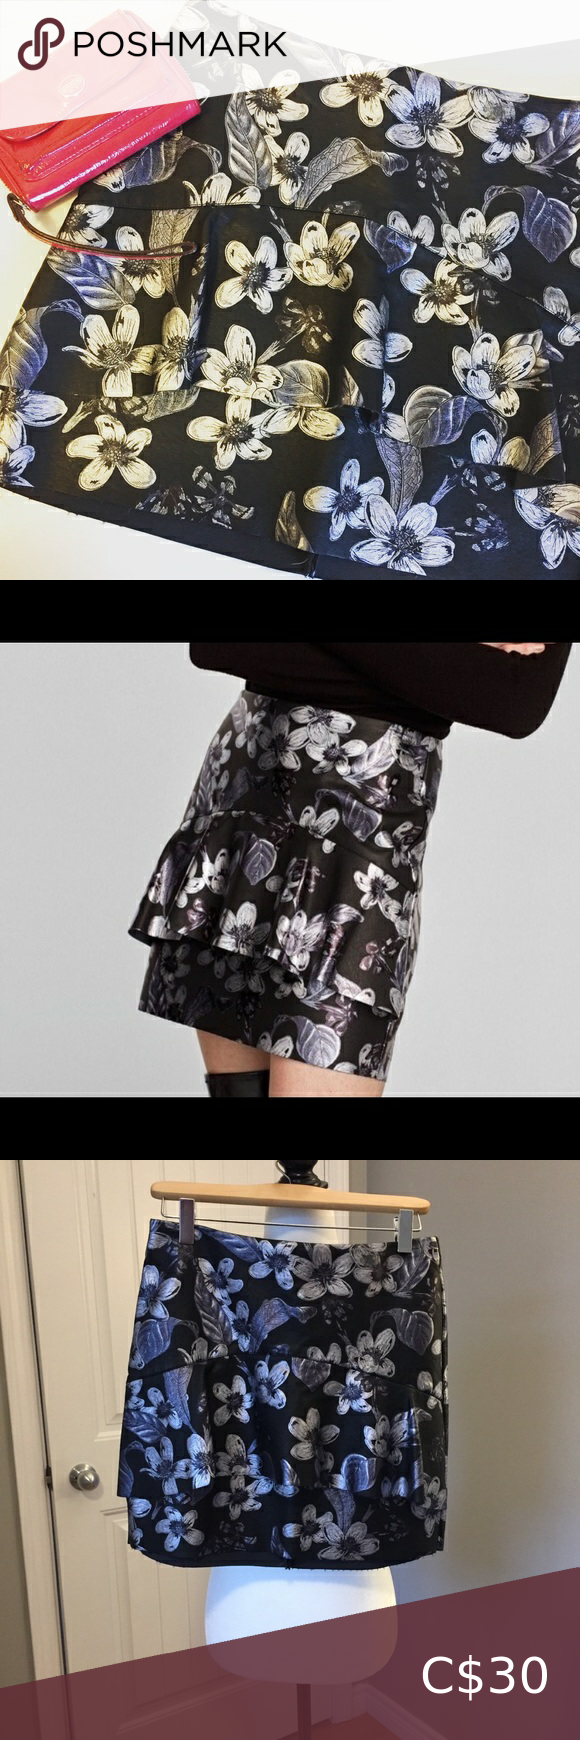 Zara Floral Faux Leather Mini Skirt